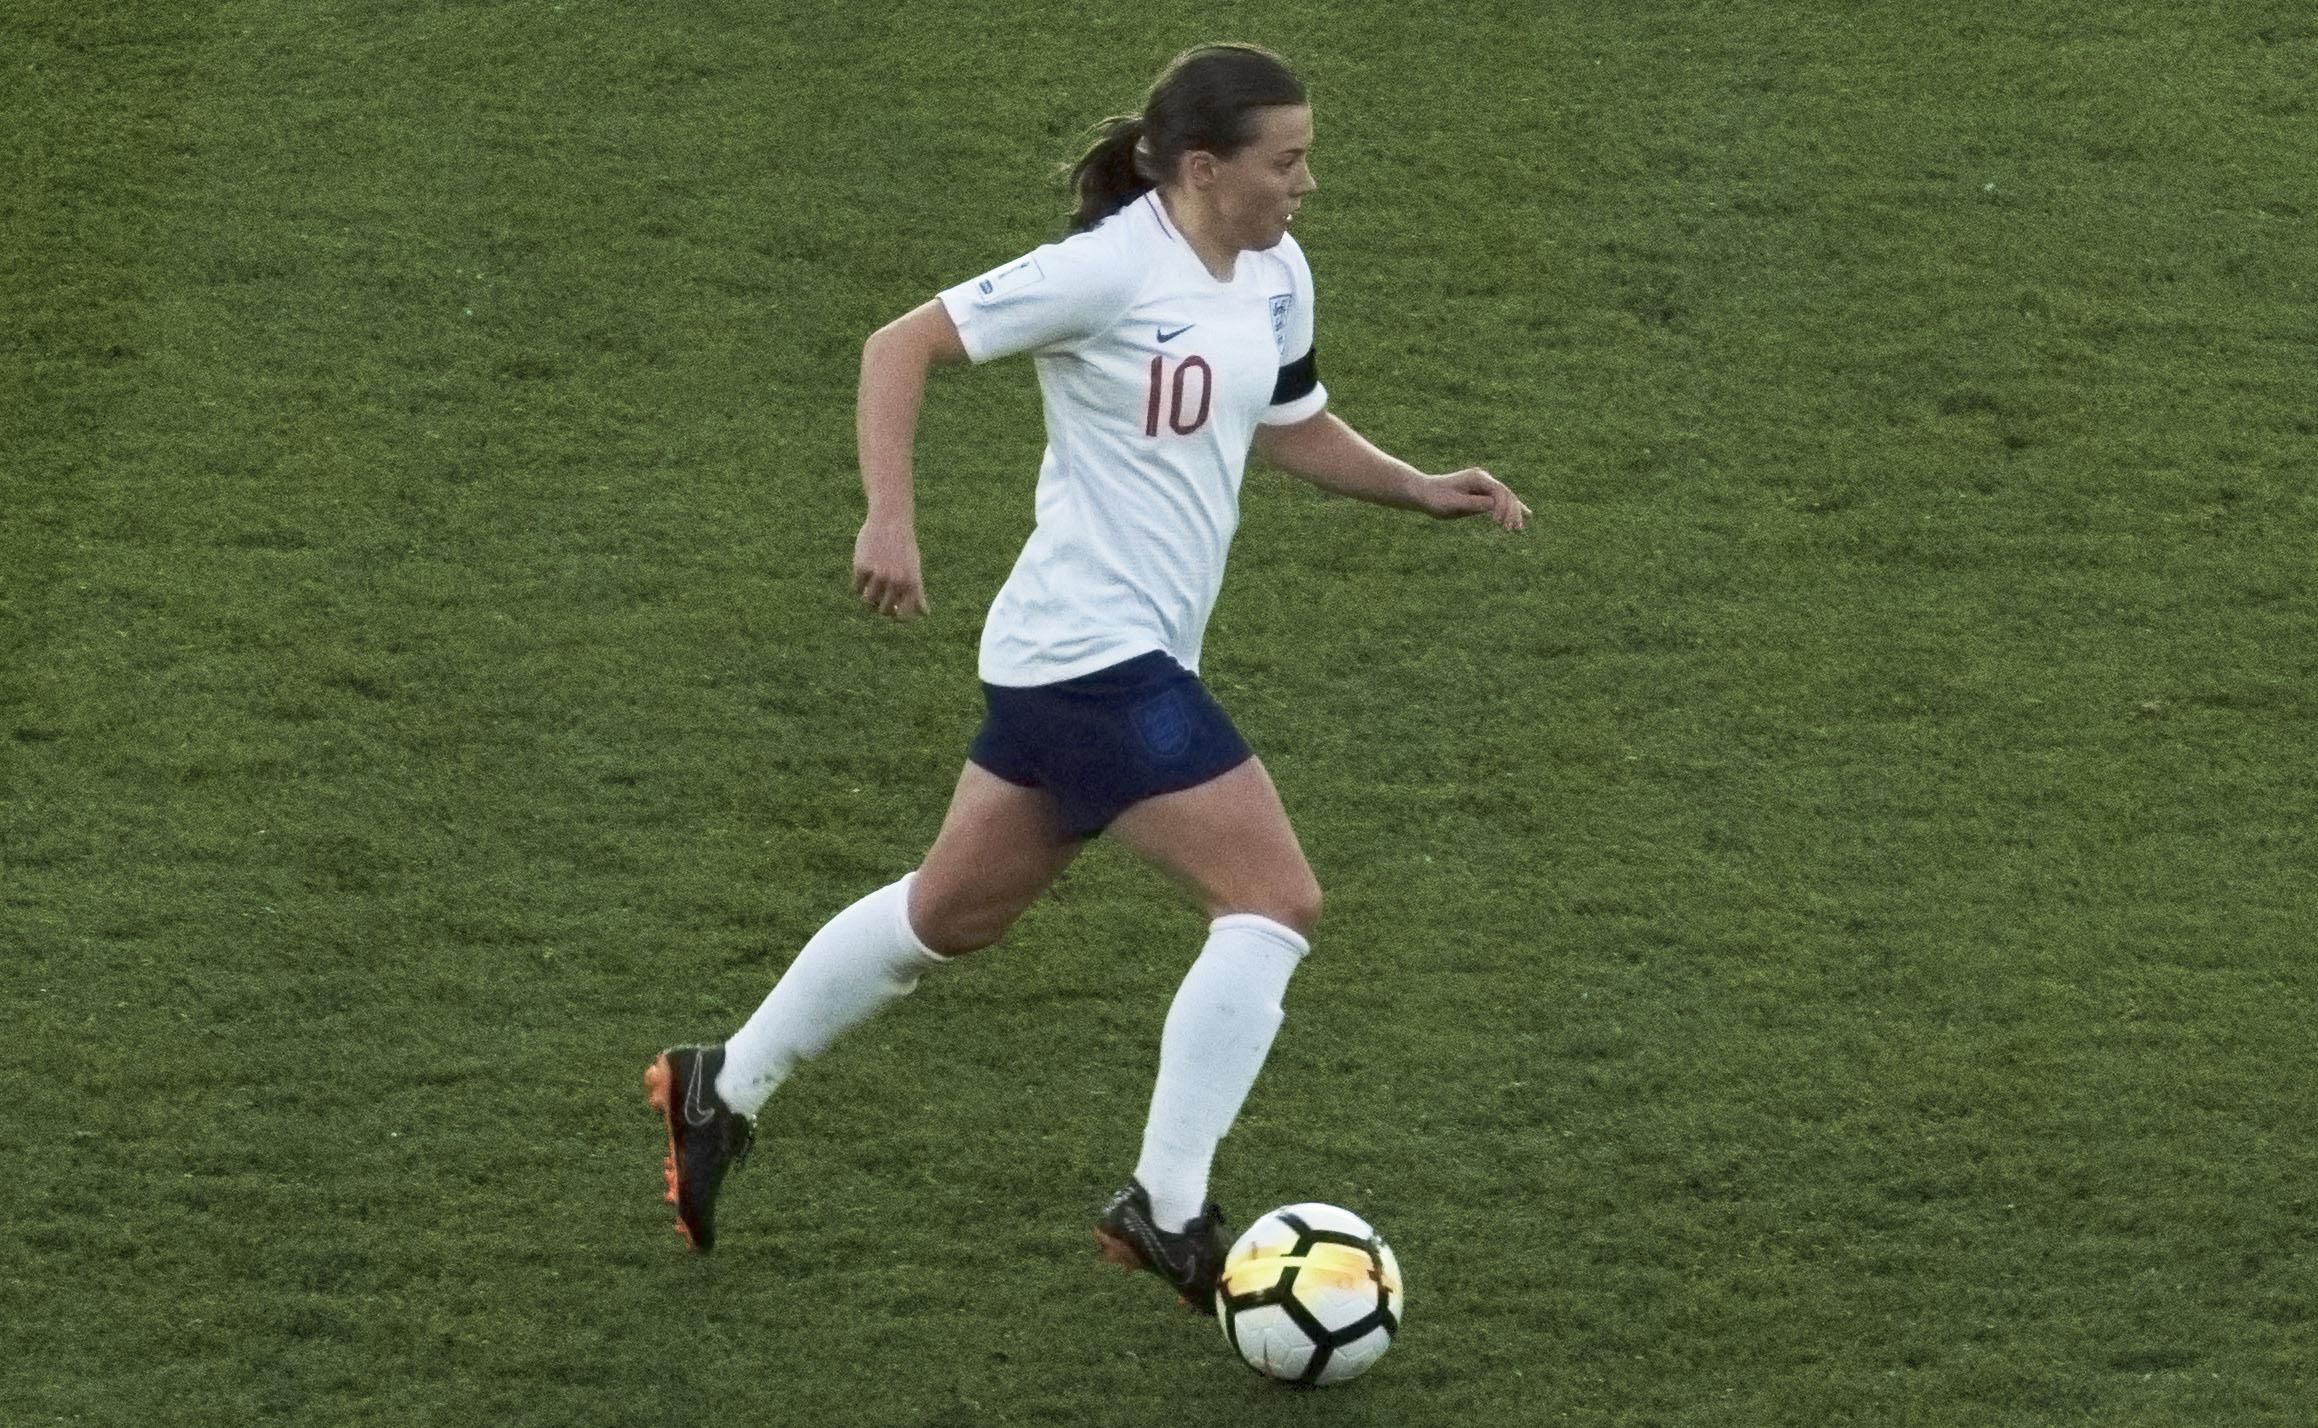 Fran Kirby, England v Wales